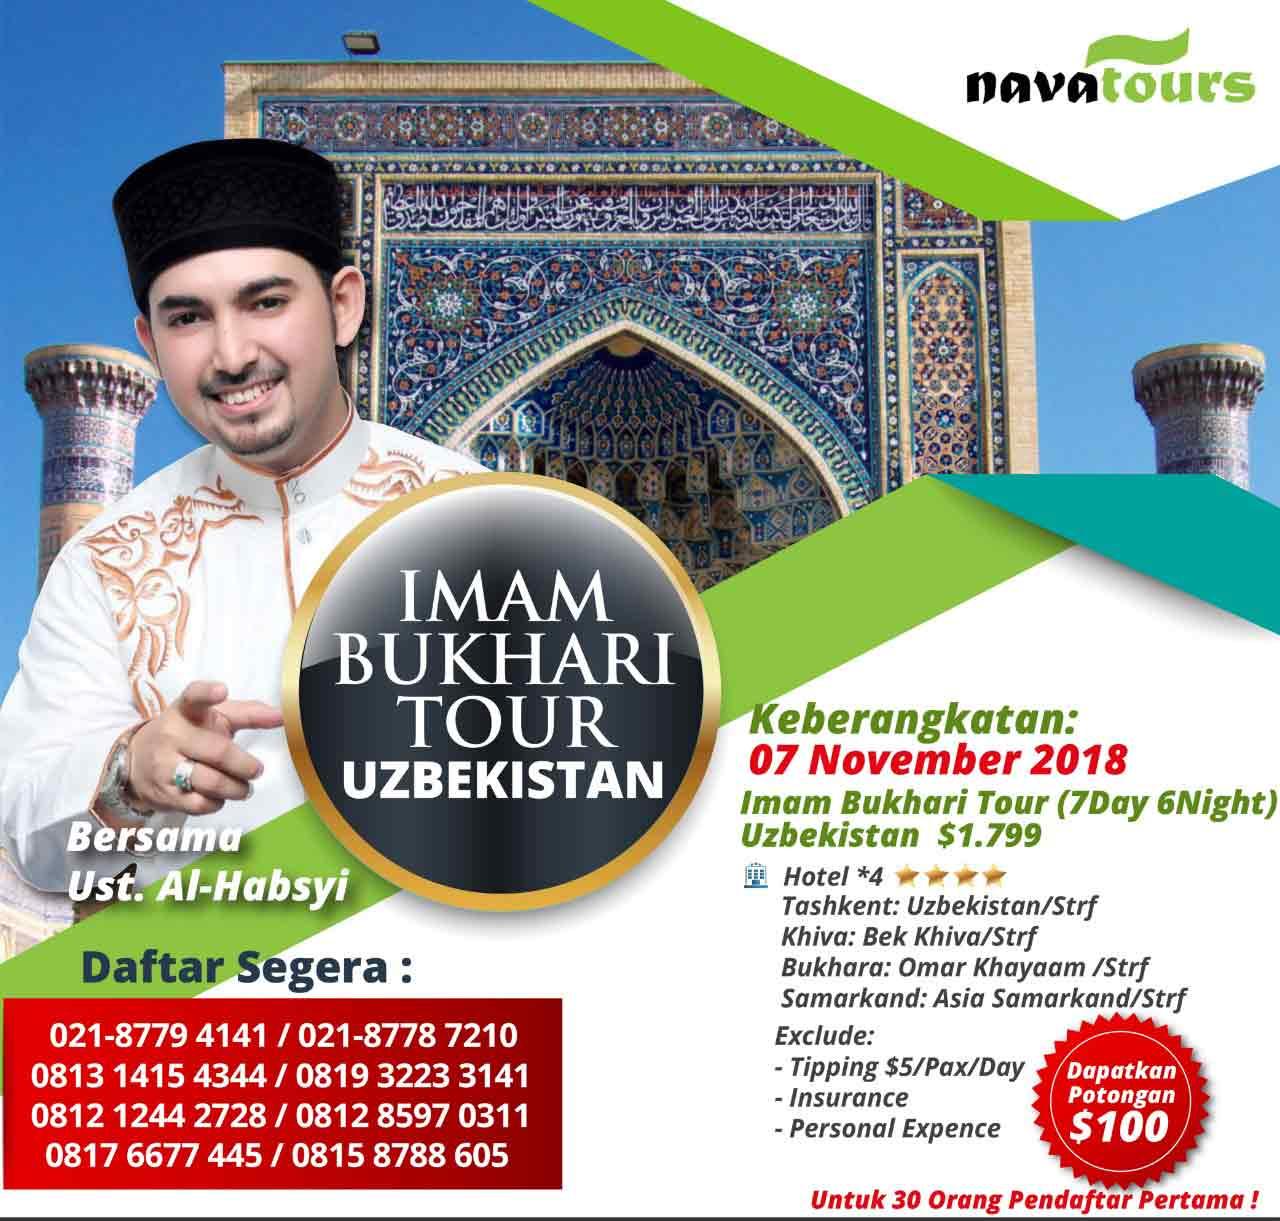 Paket Wisata Uzbekistan 7 Hari (Imam Bukhori Tour) | Nava Tour